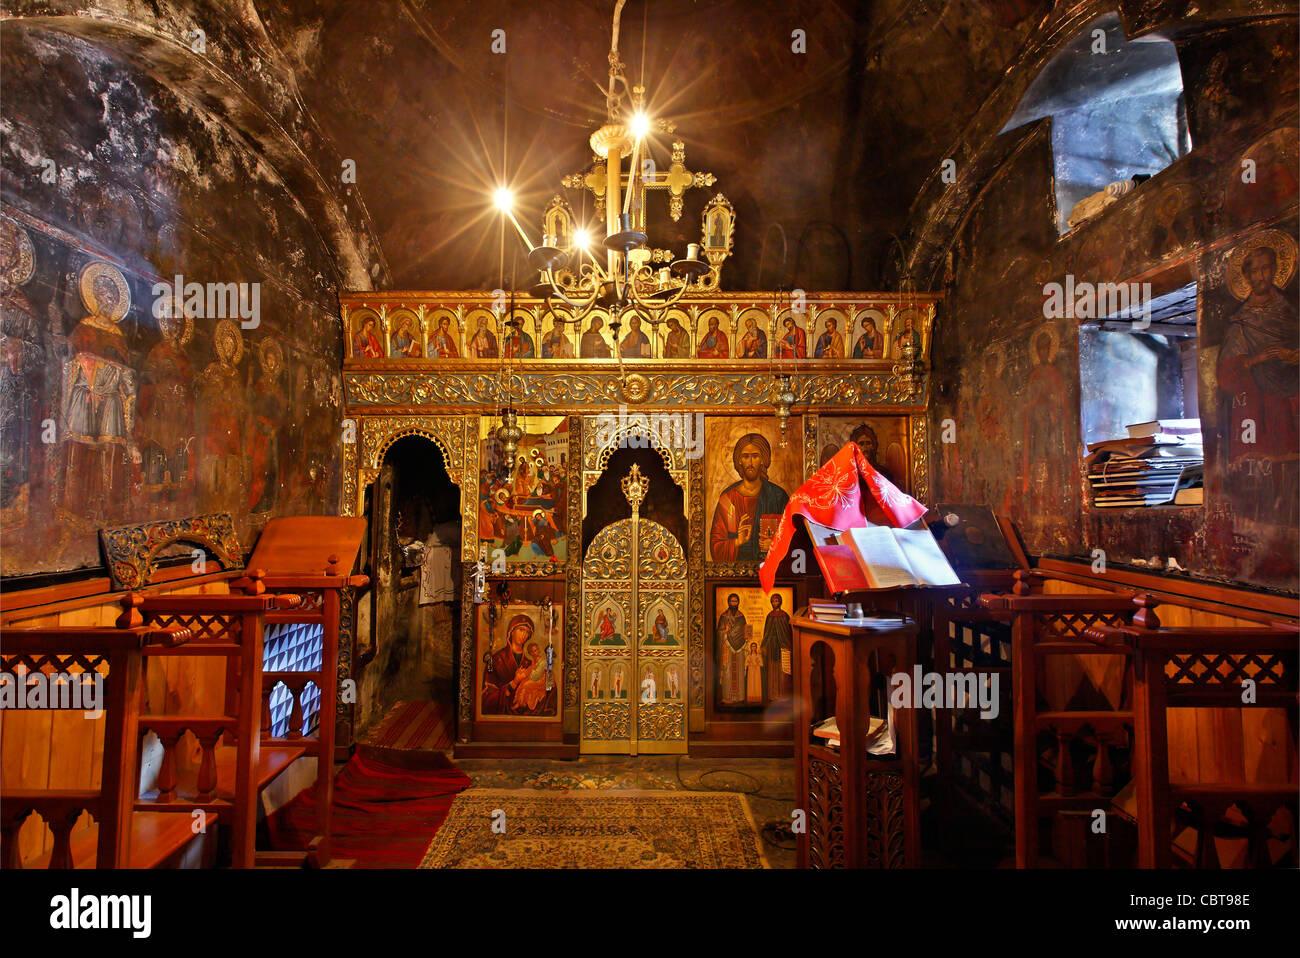 The small 'cavechurch' in the holy monastery of Kipina, Tzoumerka mountains, Ioannina, Epirus, Greece - Stock Image